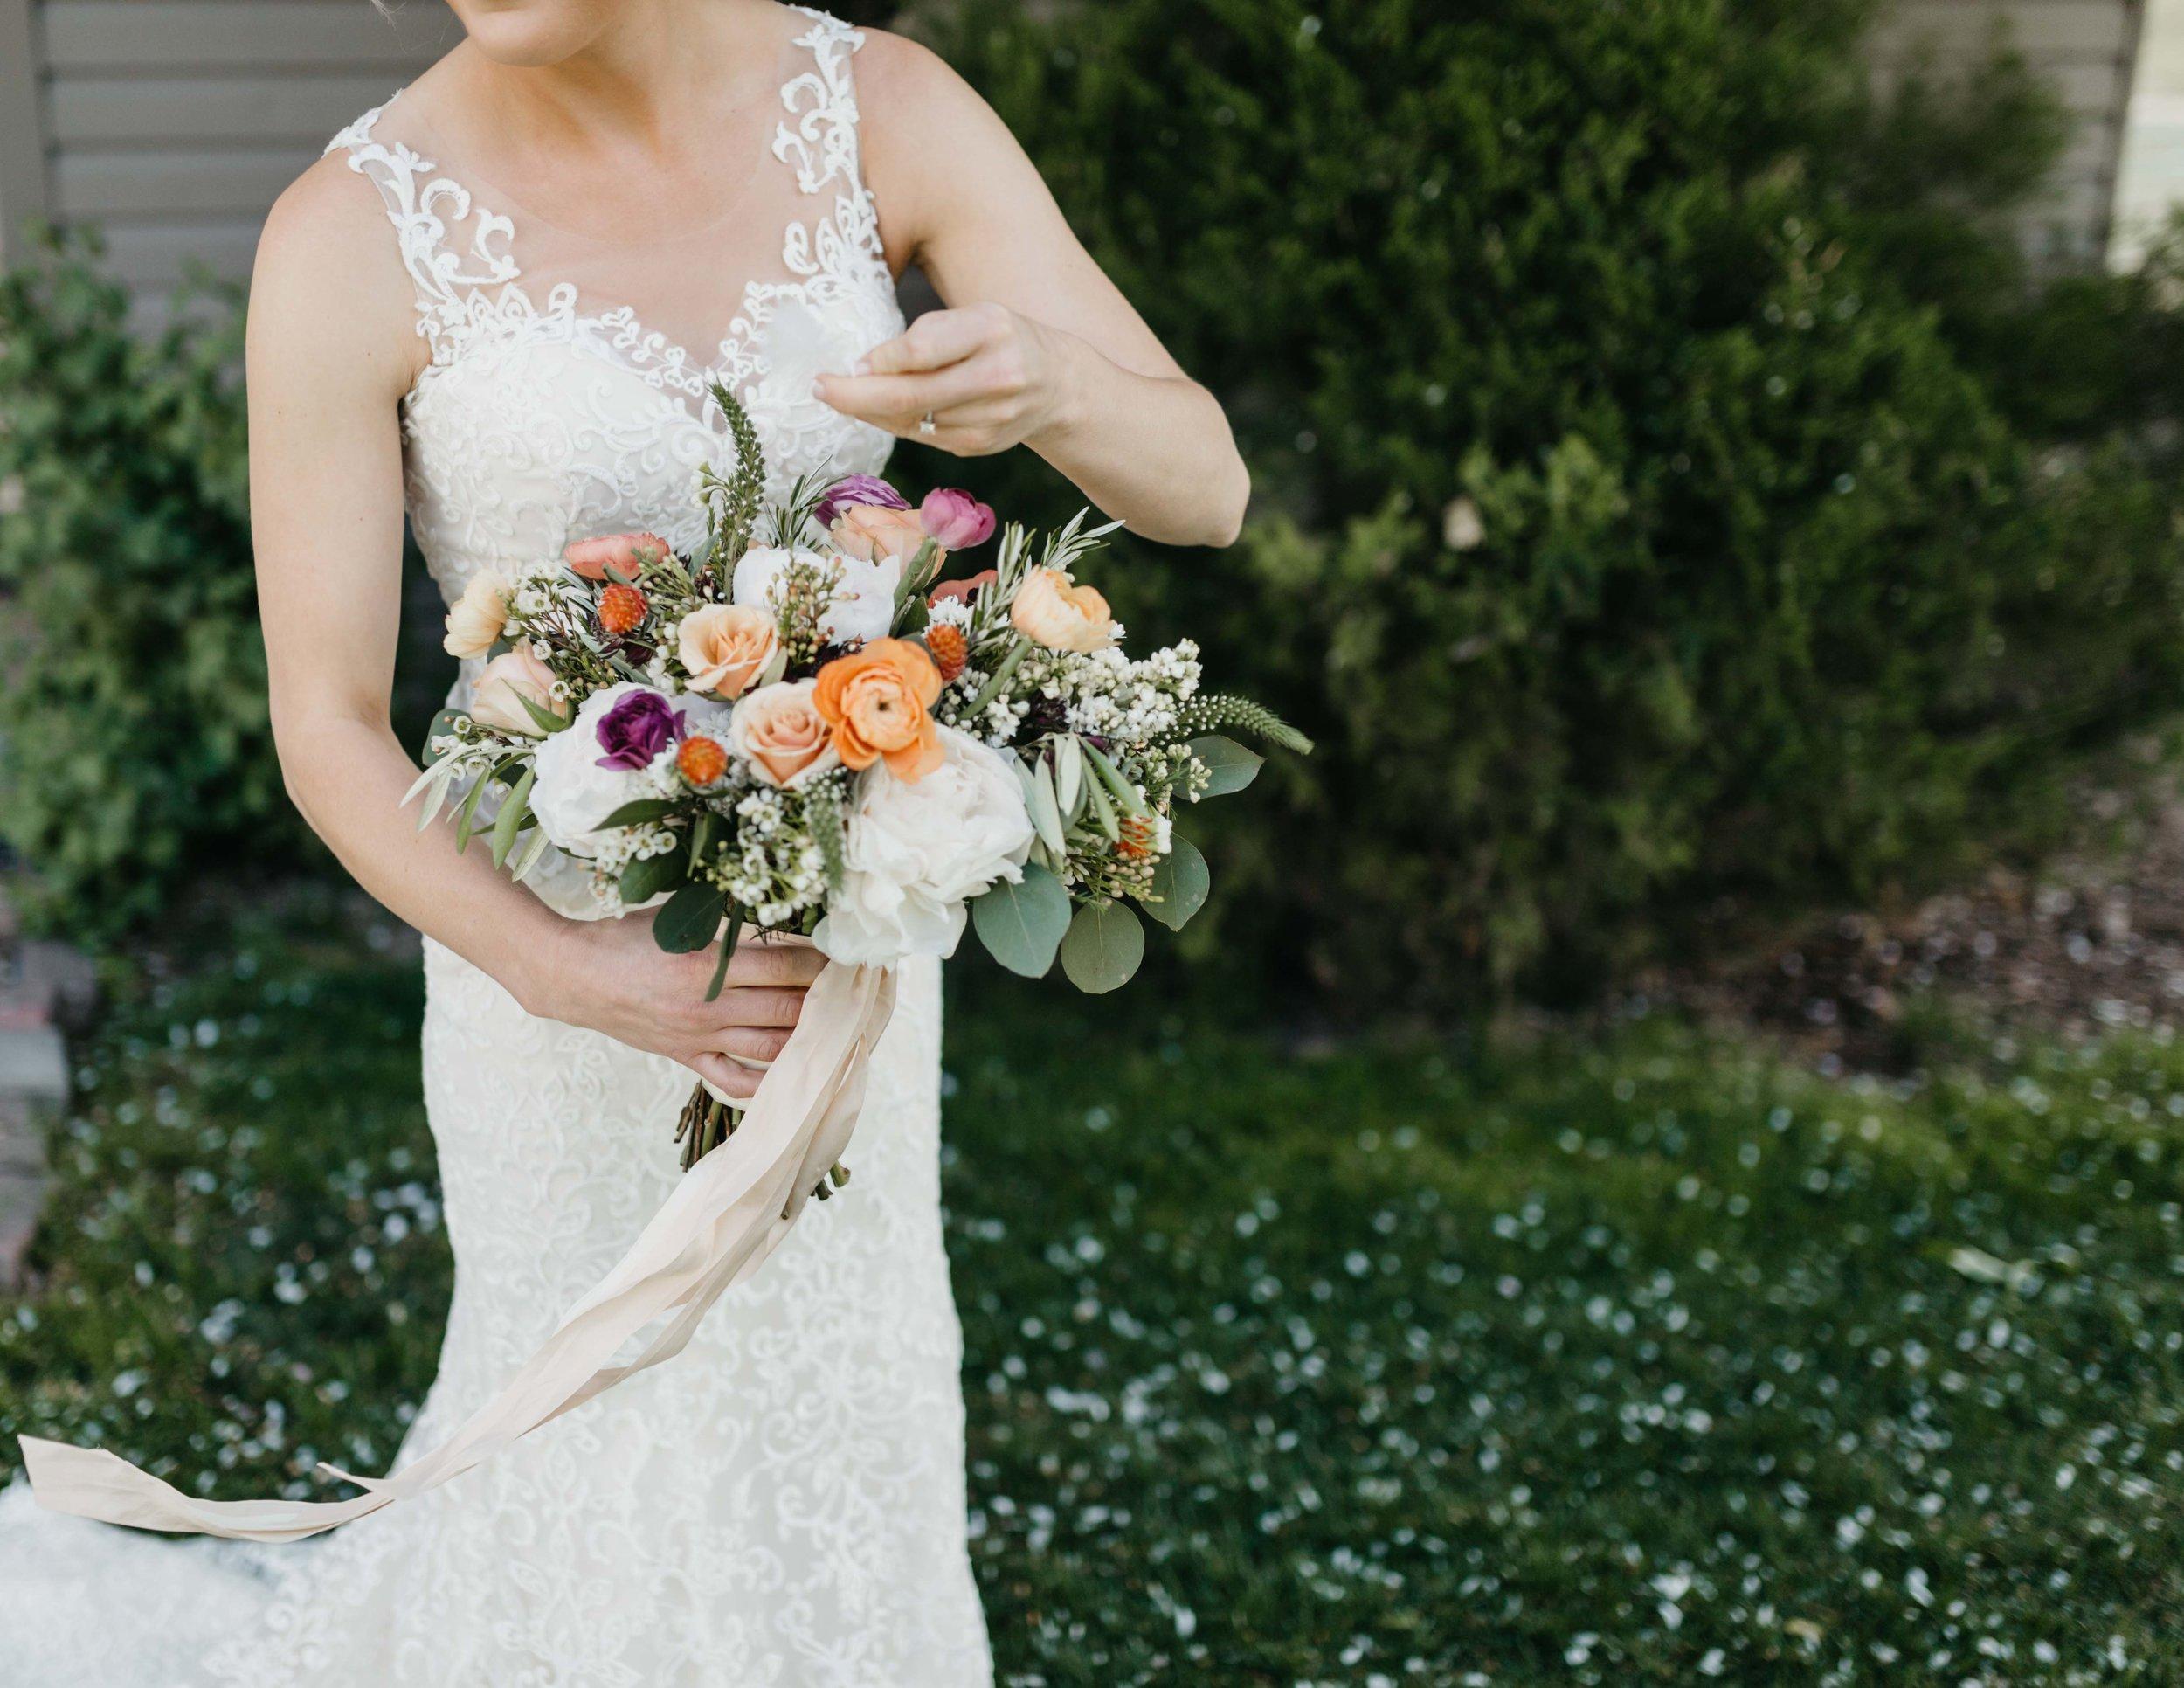 Colorado-Wedding-Photographer-16.jpg